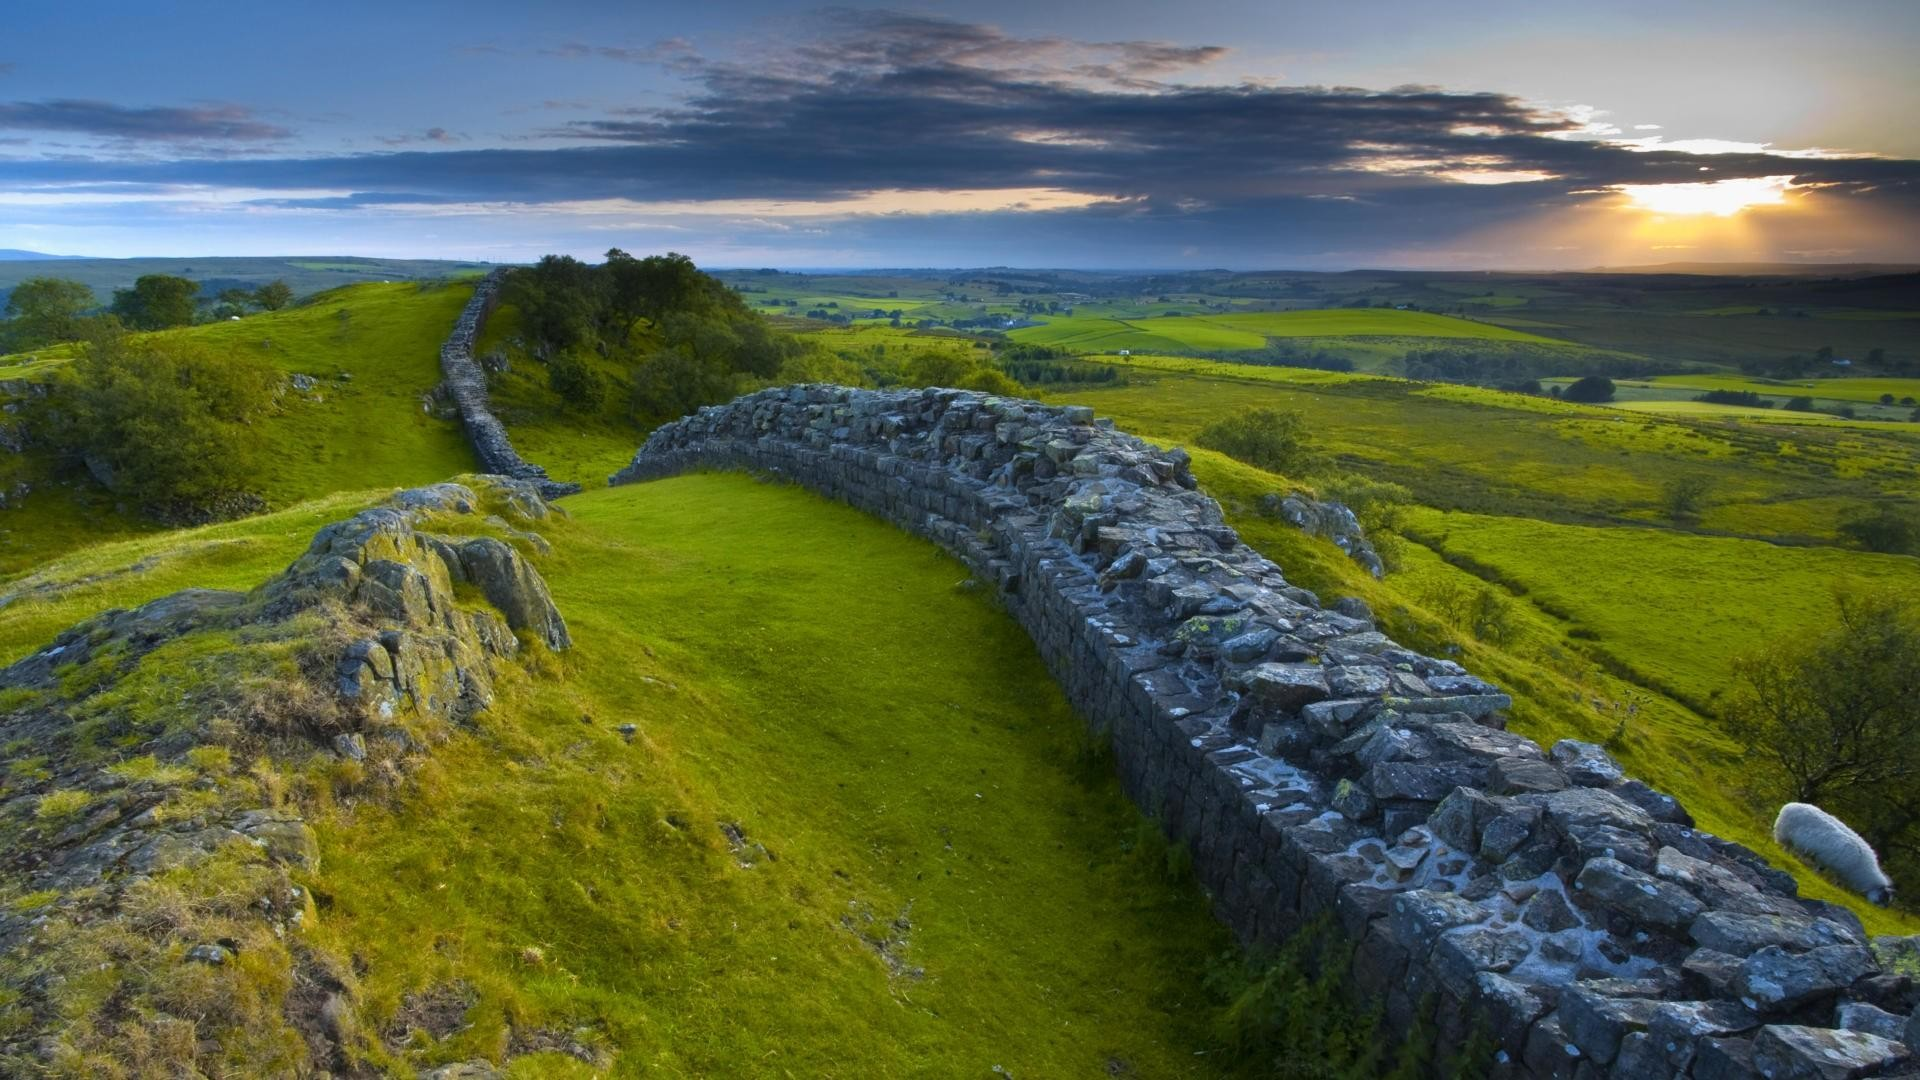 sheep landscape sky clouds roman hills sun nature field england sunlight grass animals stones history